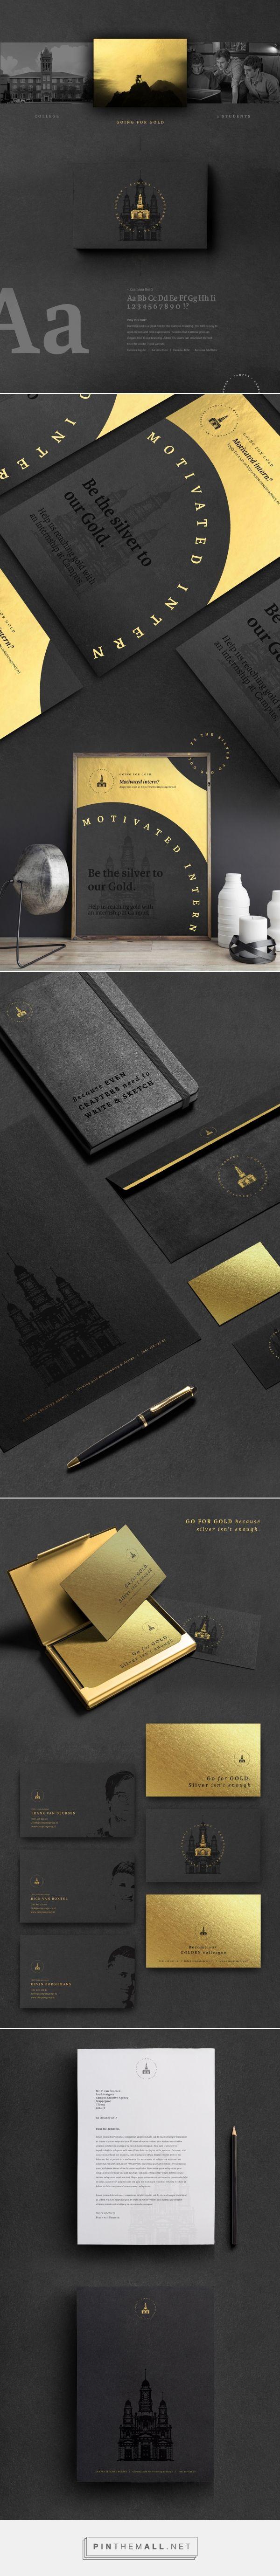 Campus Branding by Frank Van Deursen  | Fivestar Branding Agency – Design and Branding Agency & Curated Inspiration Gallery